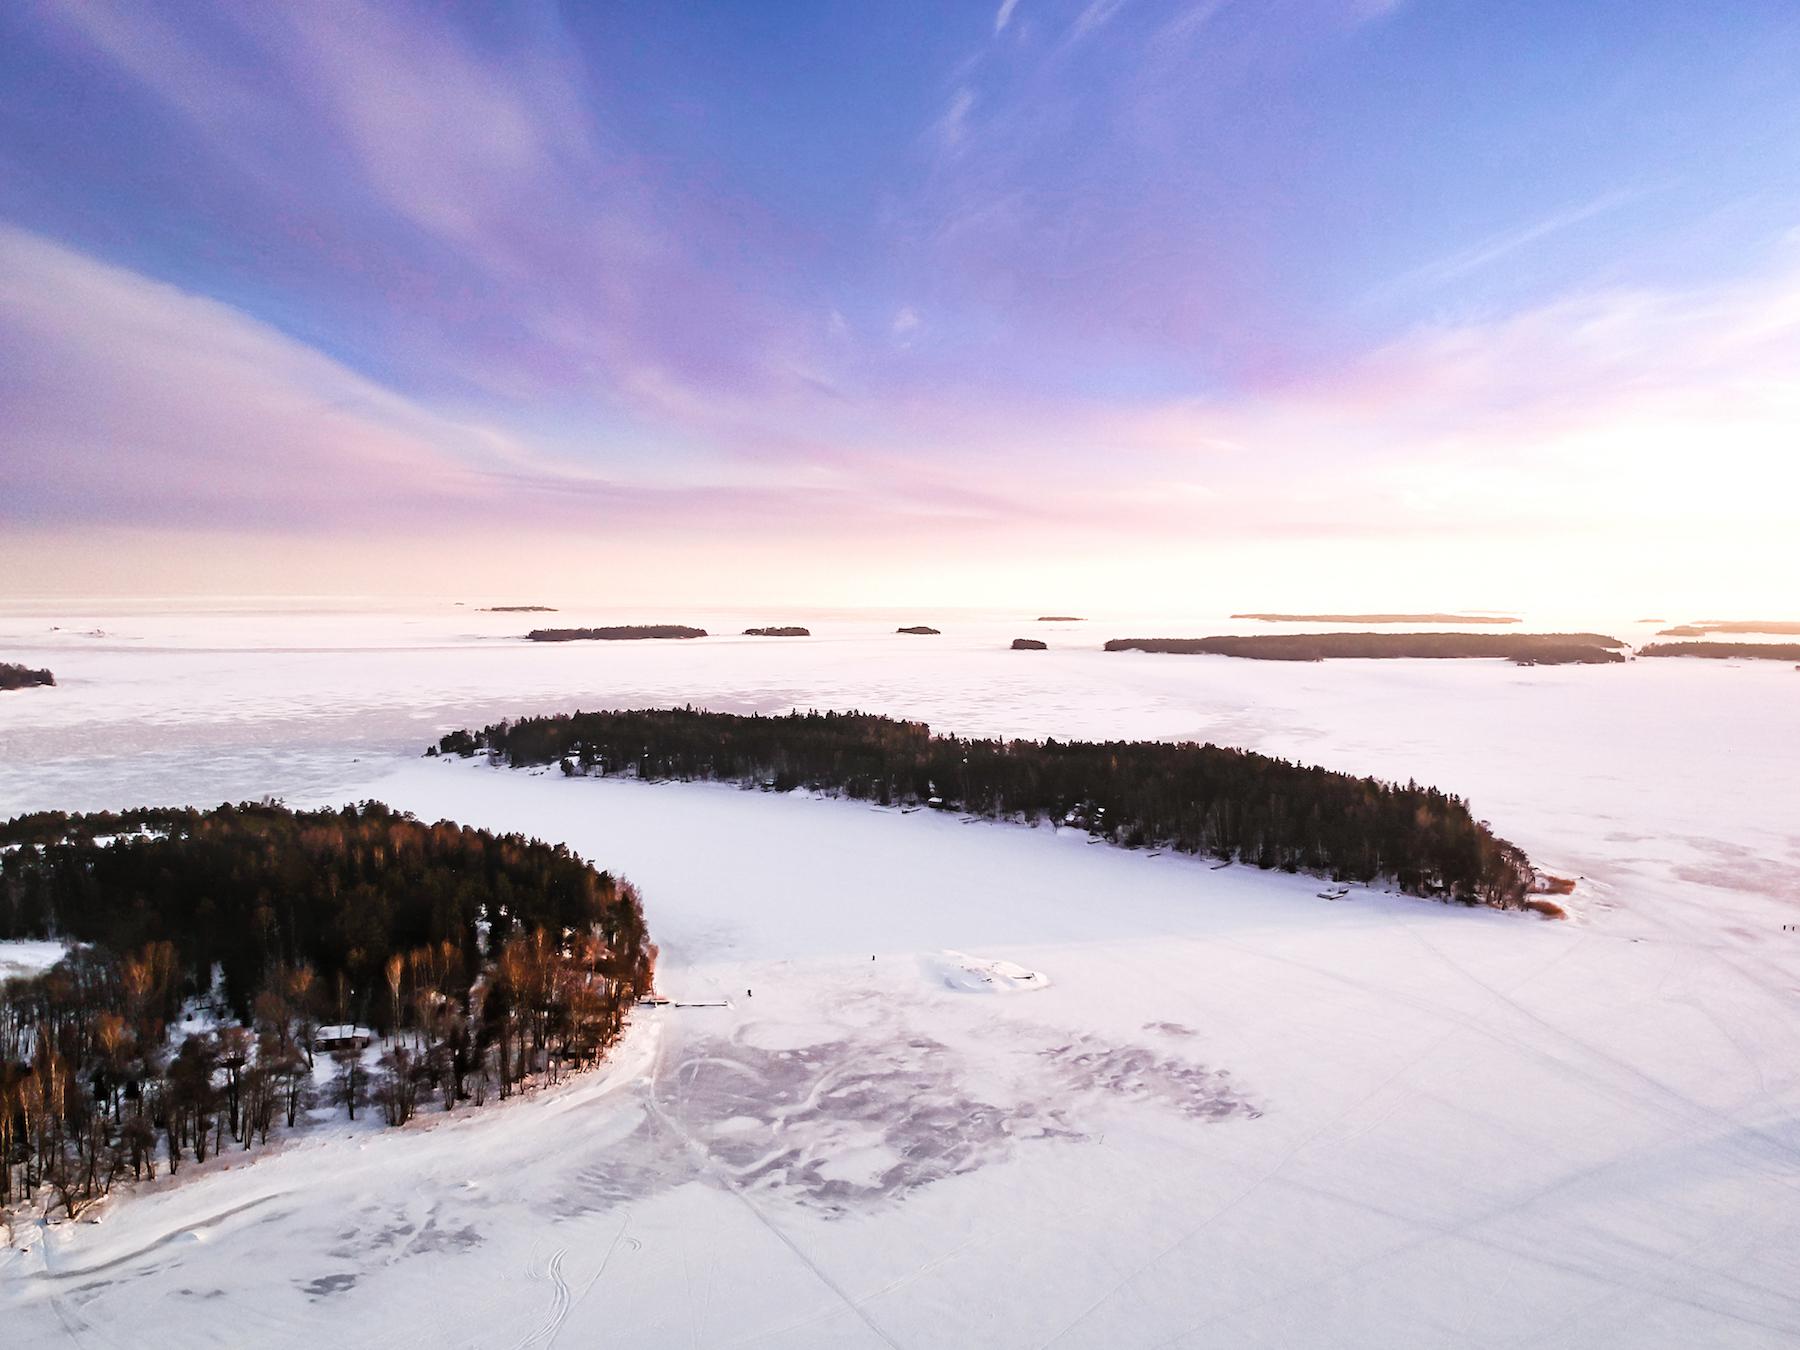 frozen-archipelagos-helsinki-Thomas-Drouault-portfolio.jpg